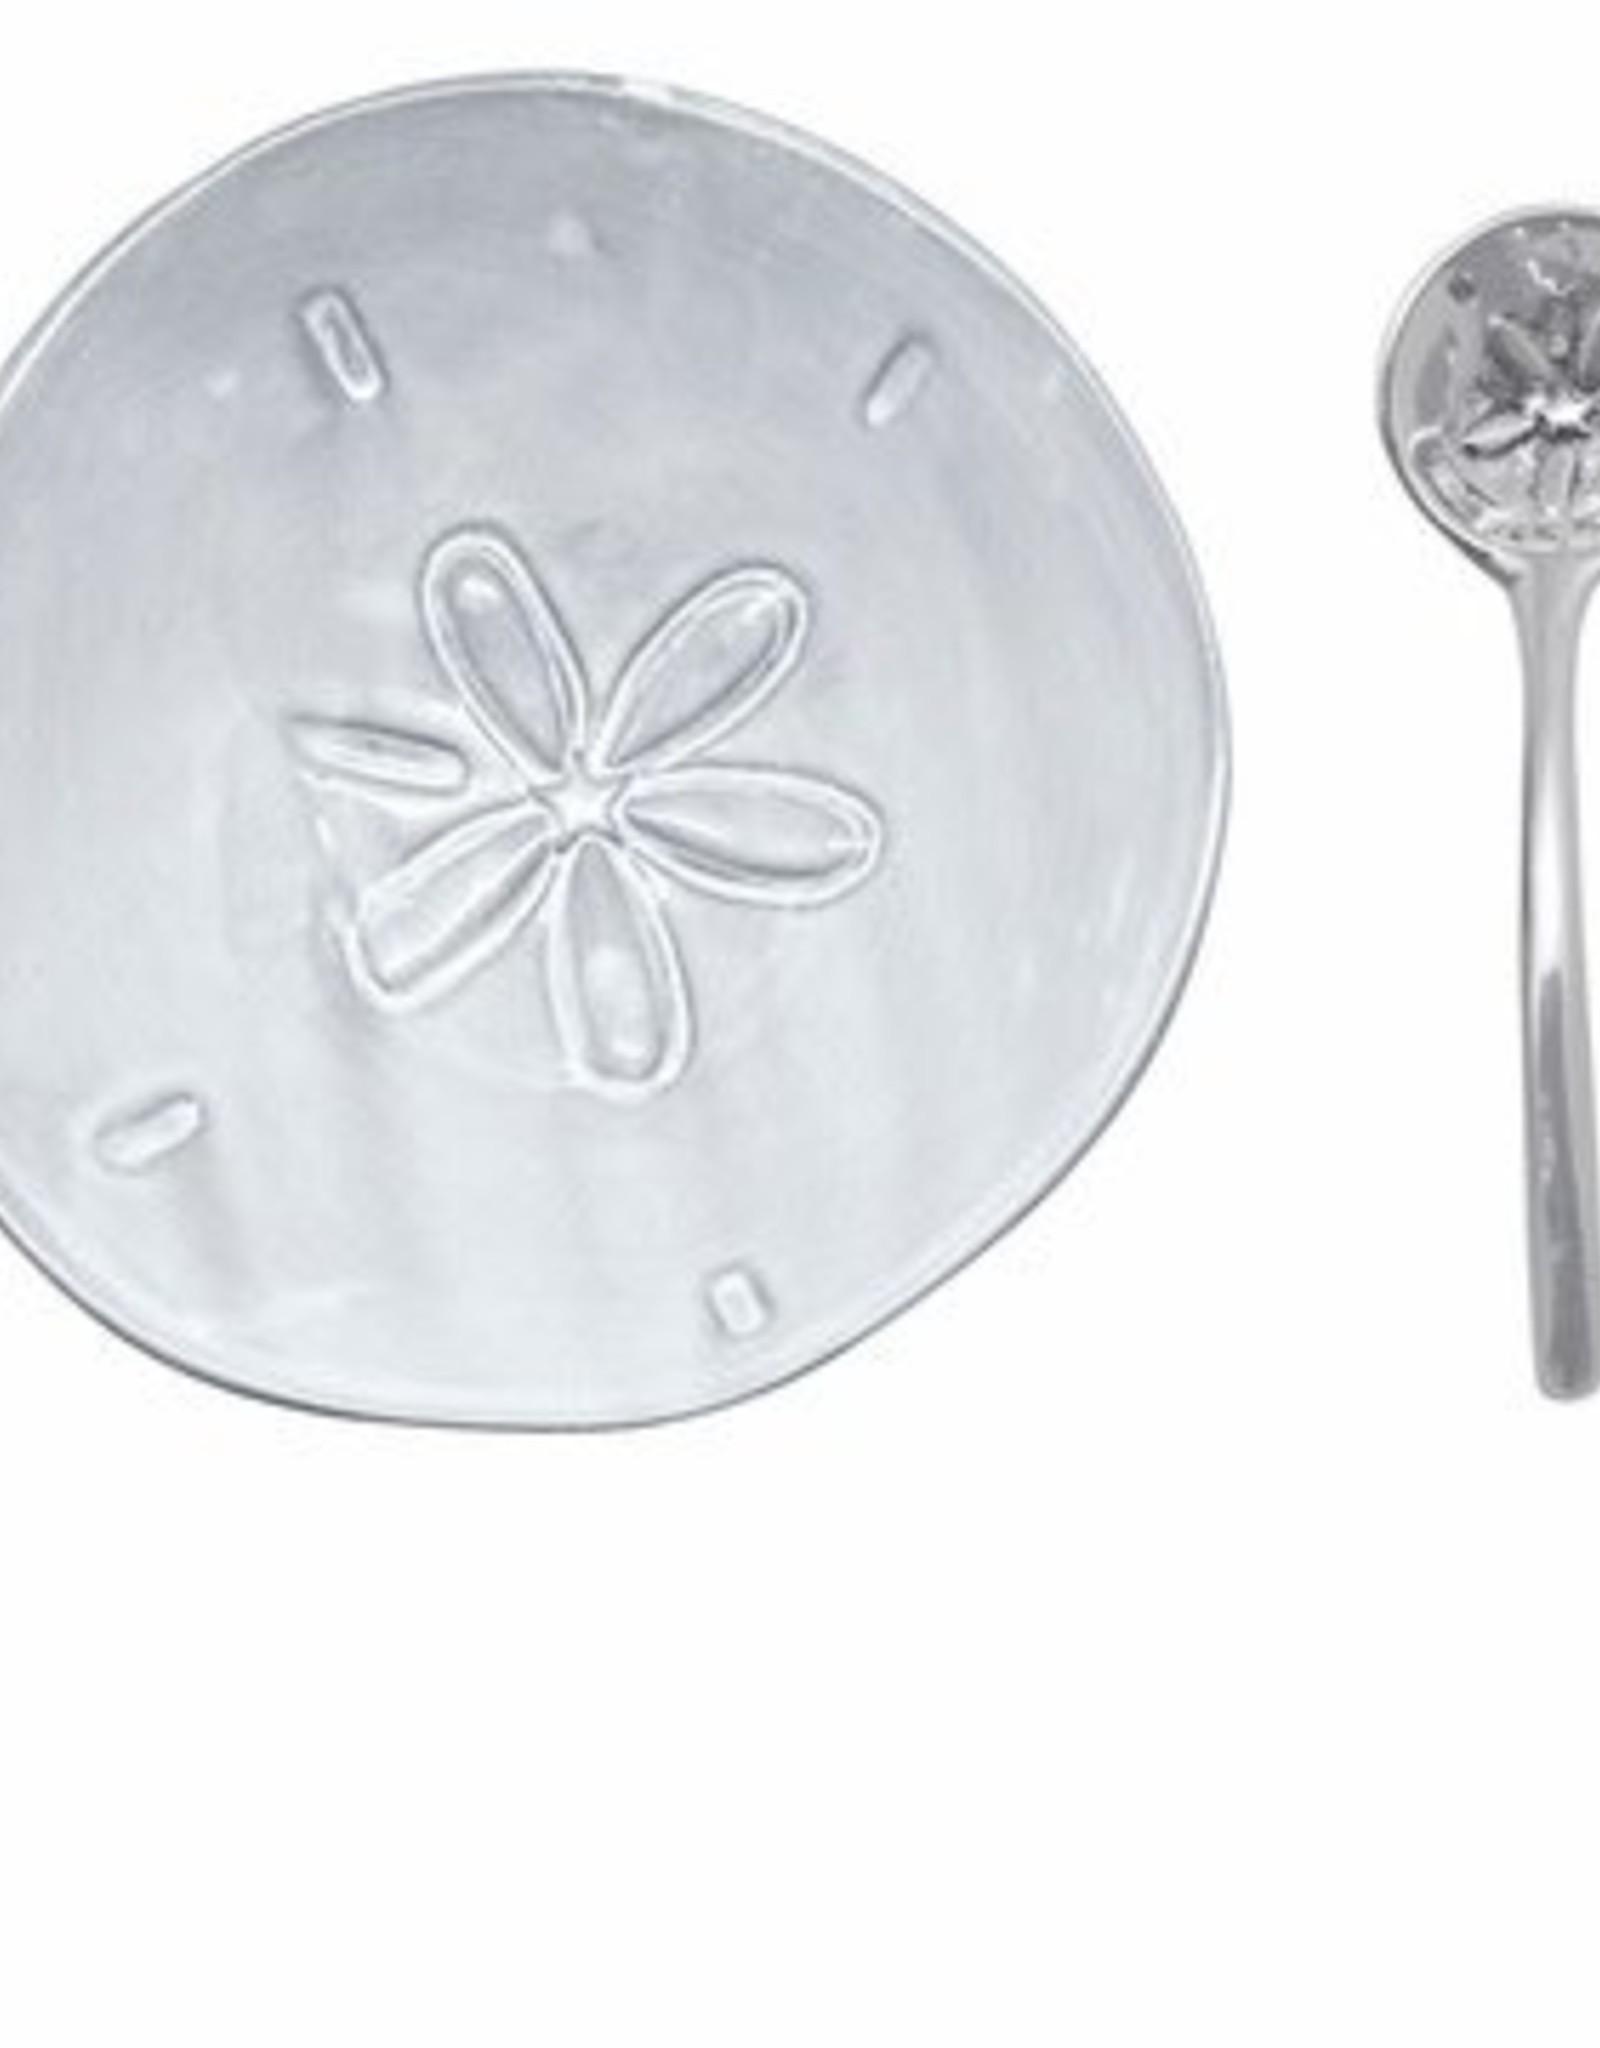 Mariposa Ceramic Canape Sets by Mariposa